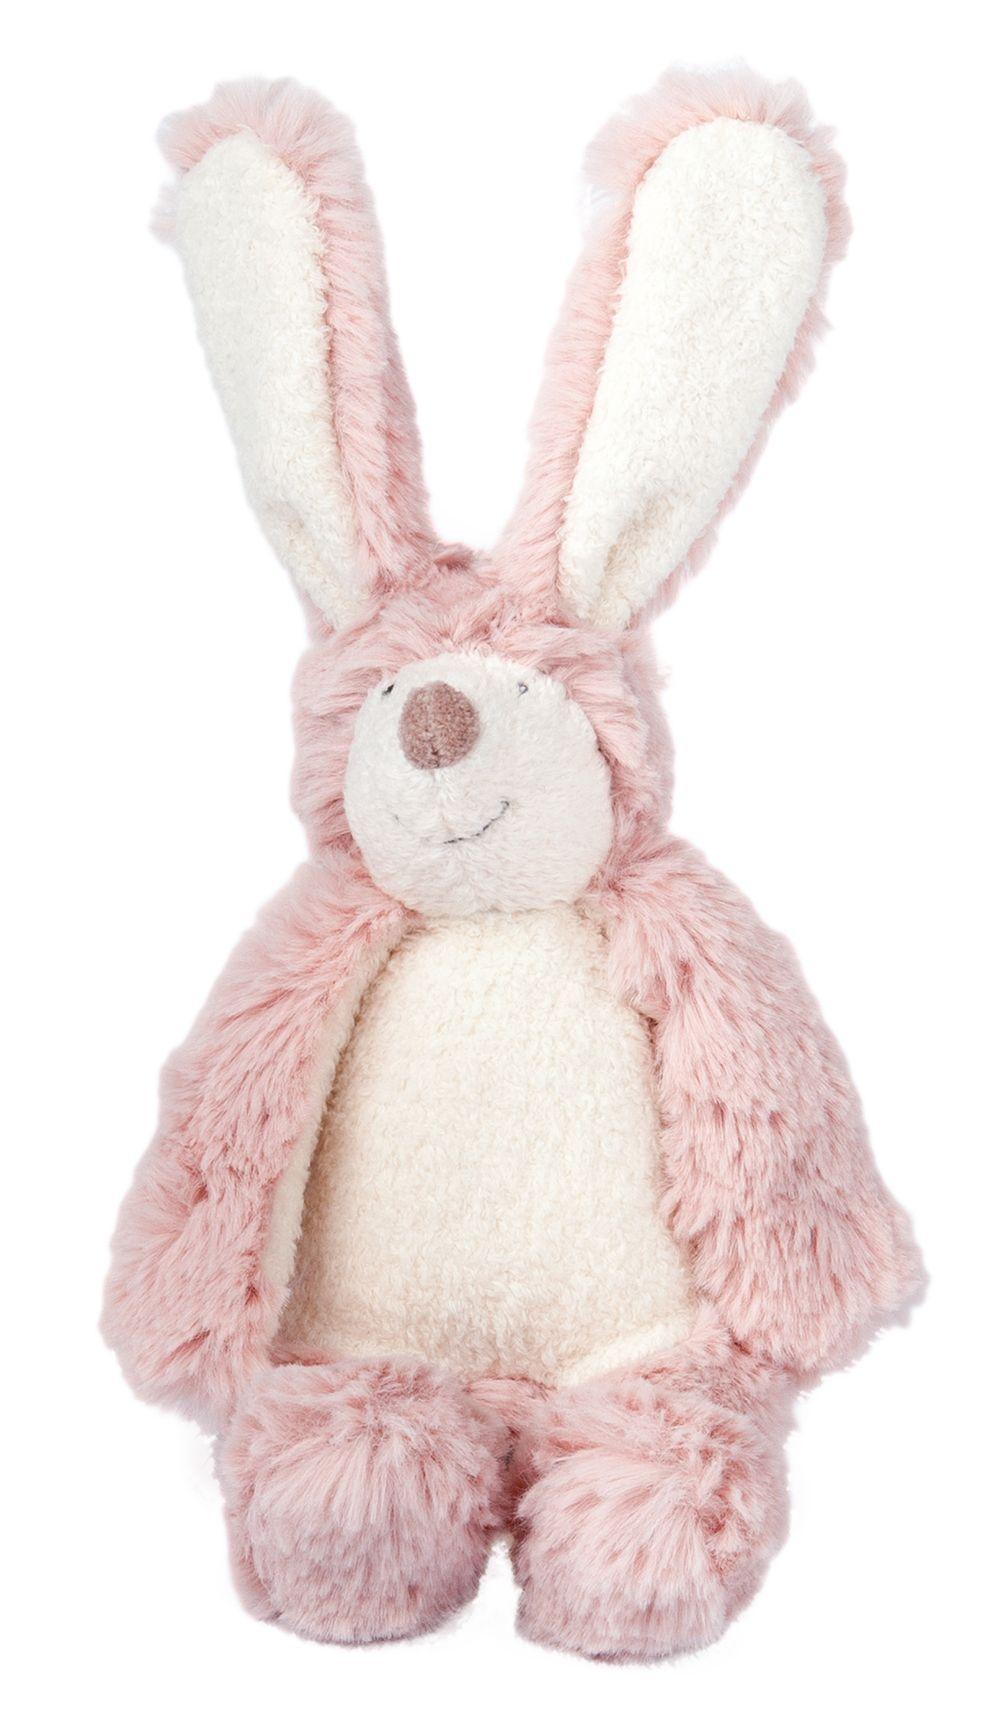 Small Pink Rabbit from La Bande à Basile - Vite un Câlin #638406 #magicforesttoys #moulinroty